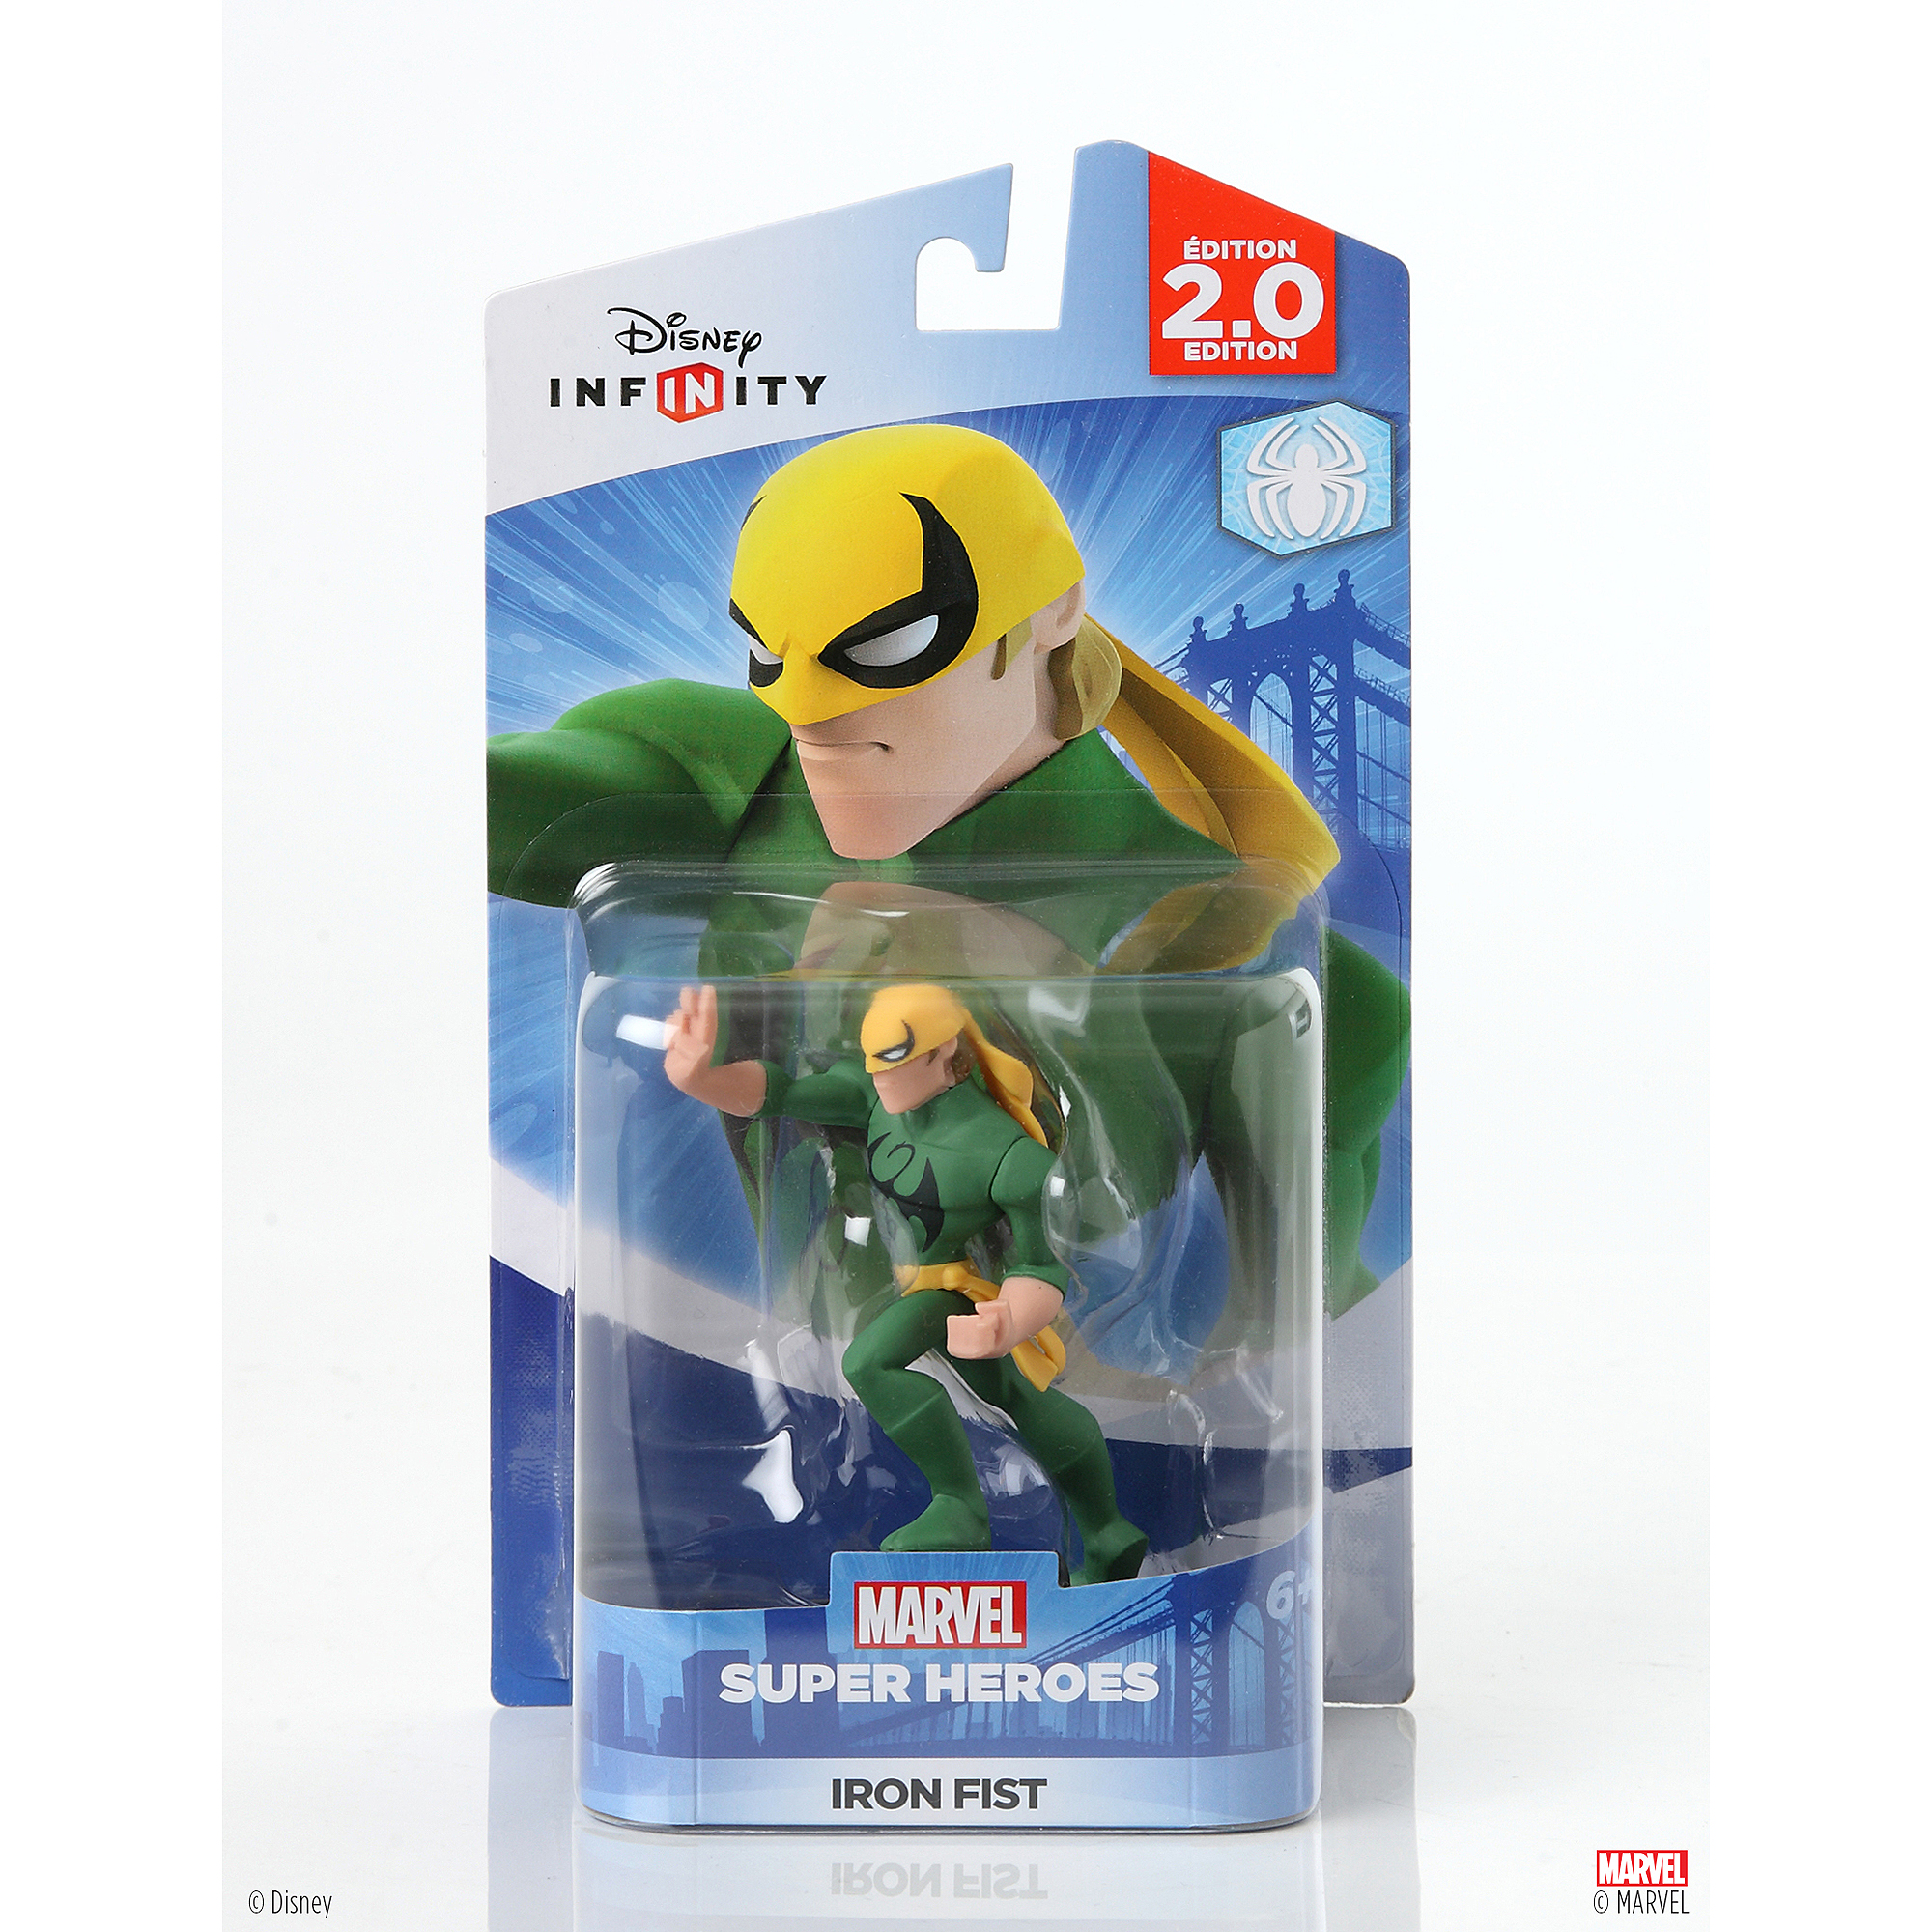 Disney Infinity: Marvel Super Heroes (2.0 Edition) Iron Fist Figure (Universal)